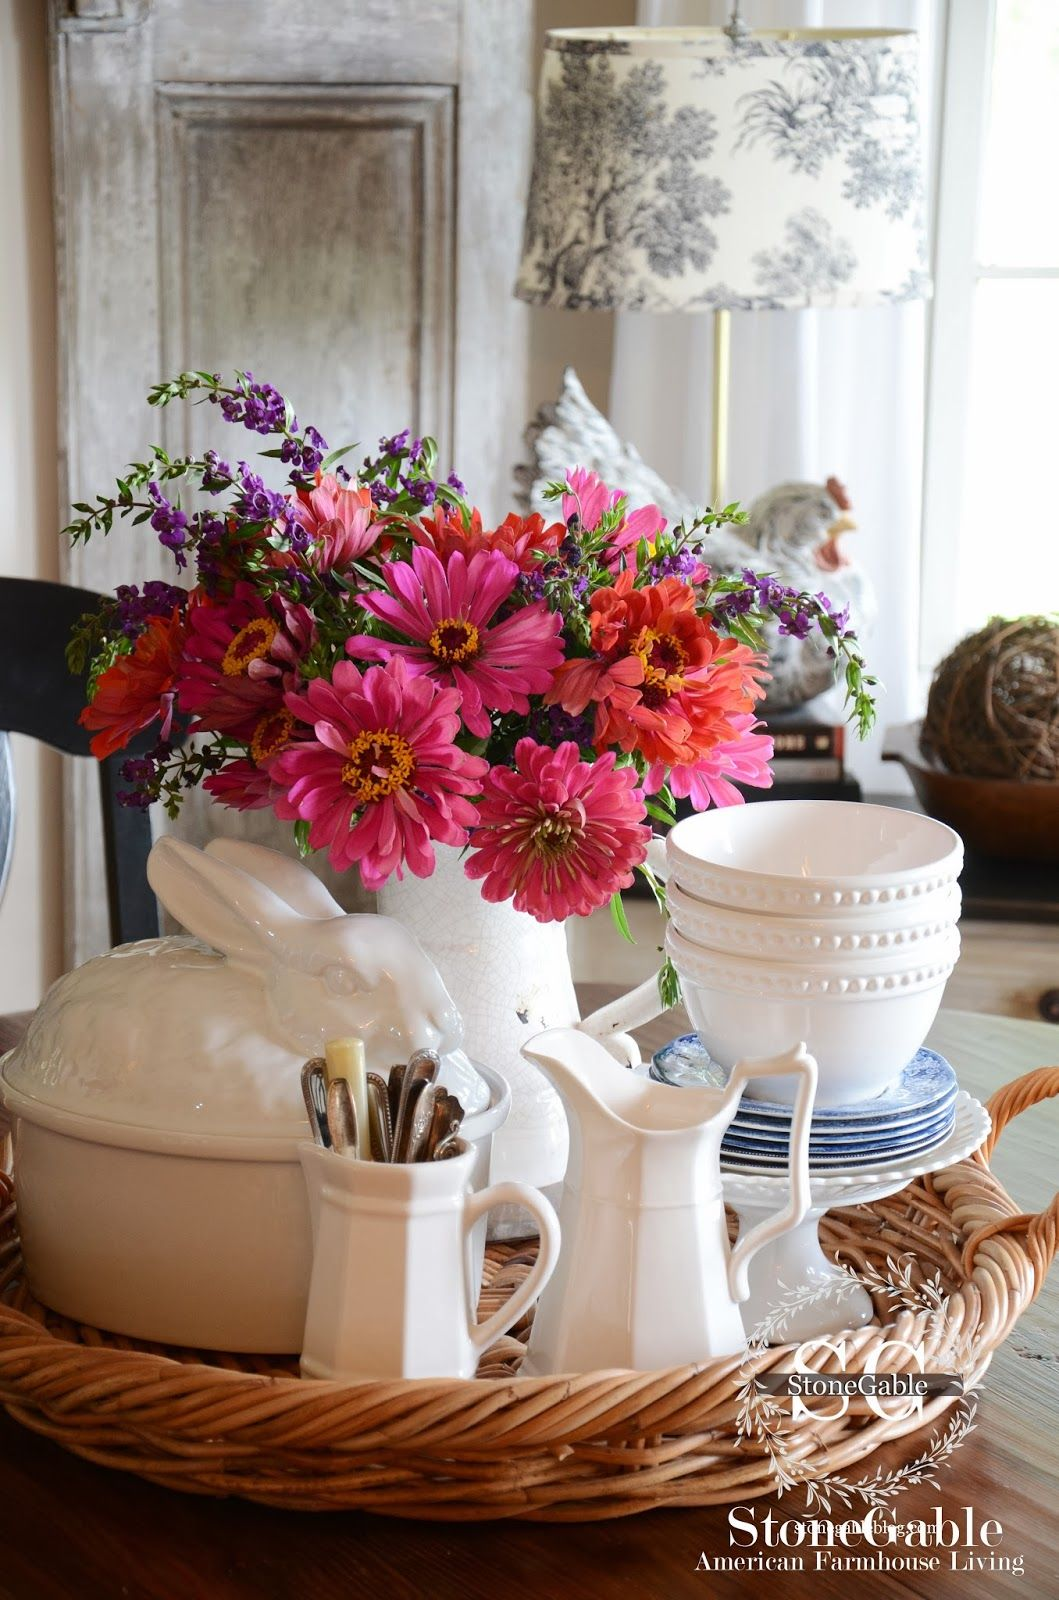 6 TIPS FOR CREATING A KITCHEN TABLE VIGNETTE | Frühling, Tabletts ...